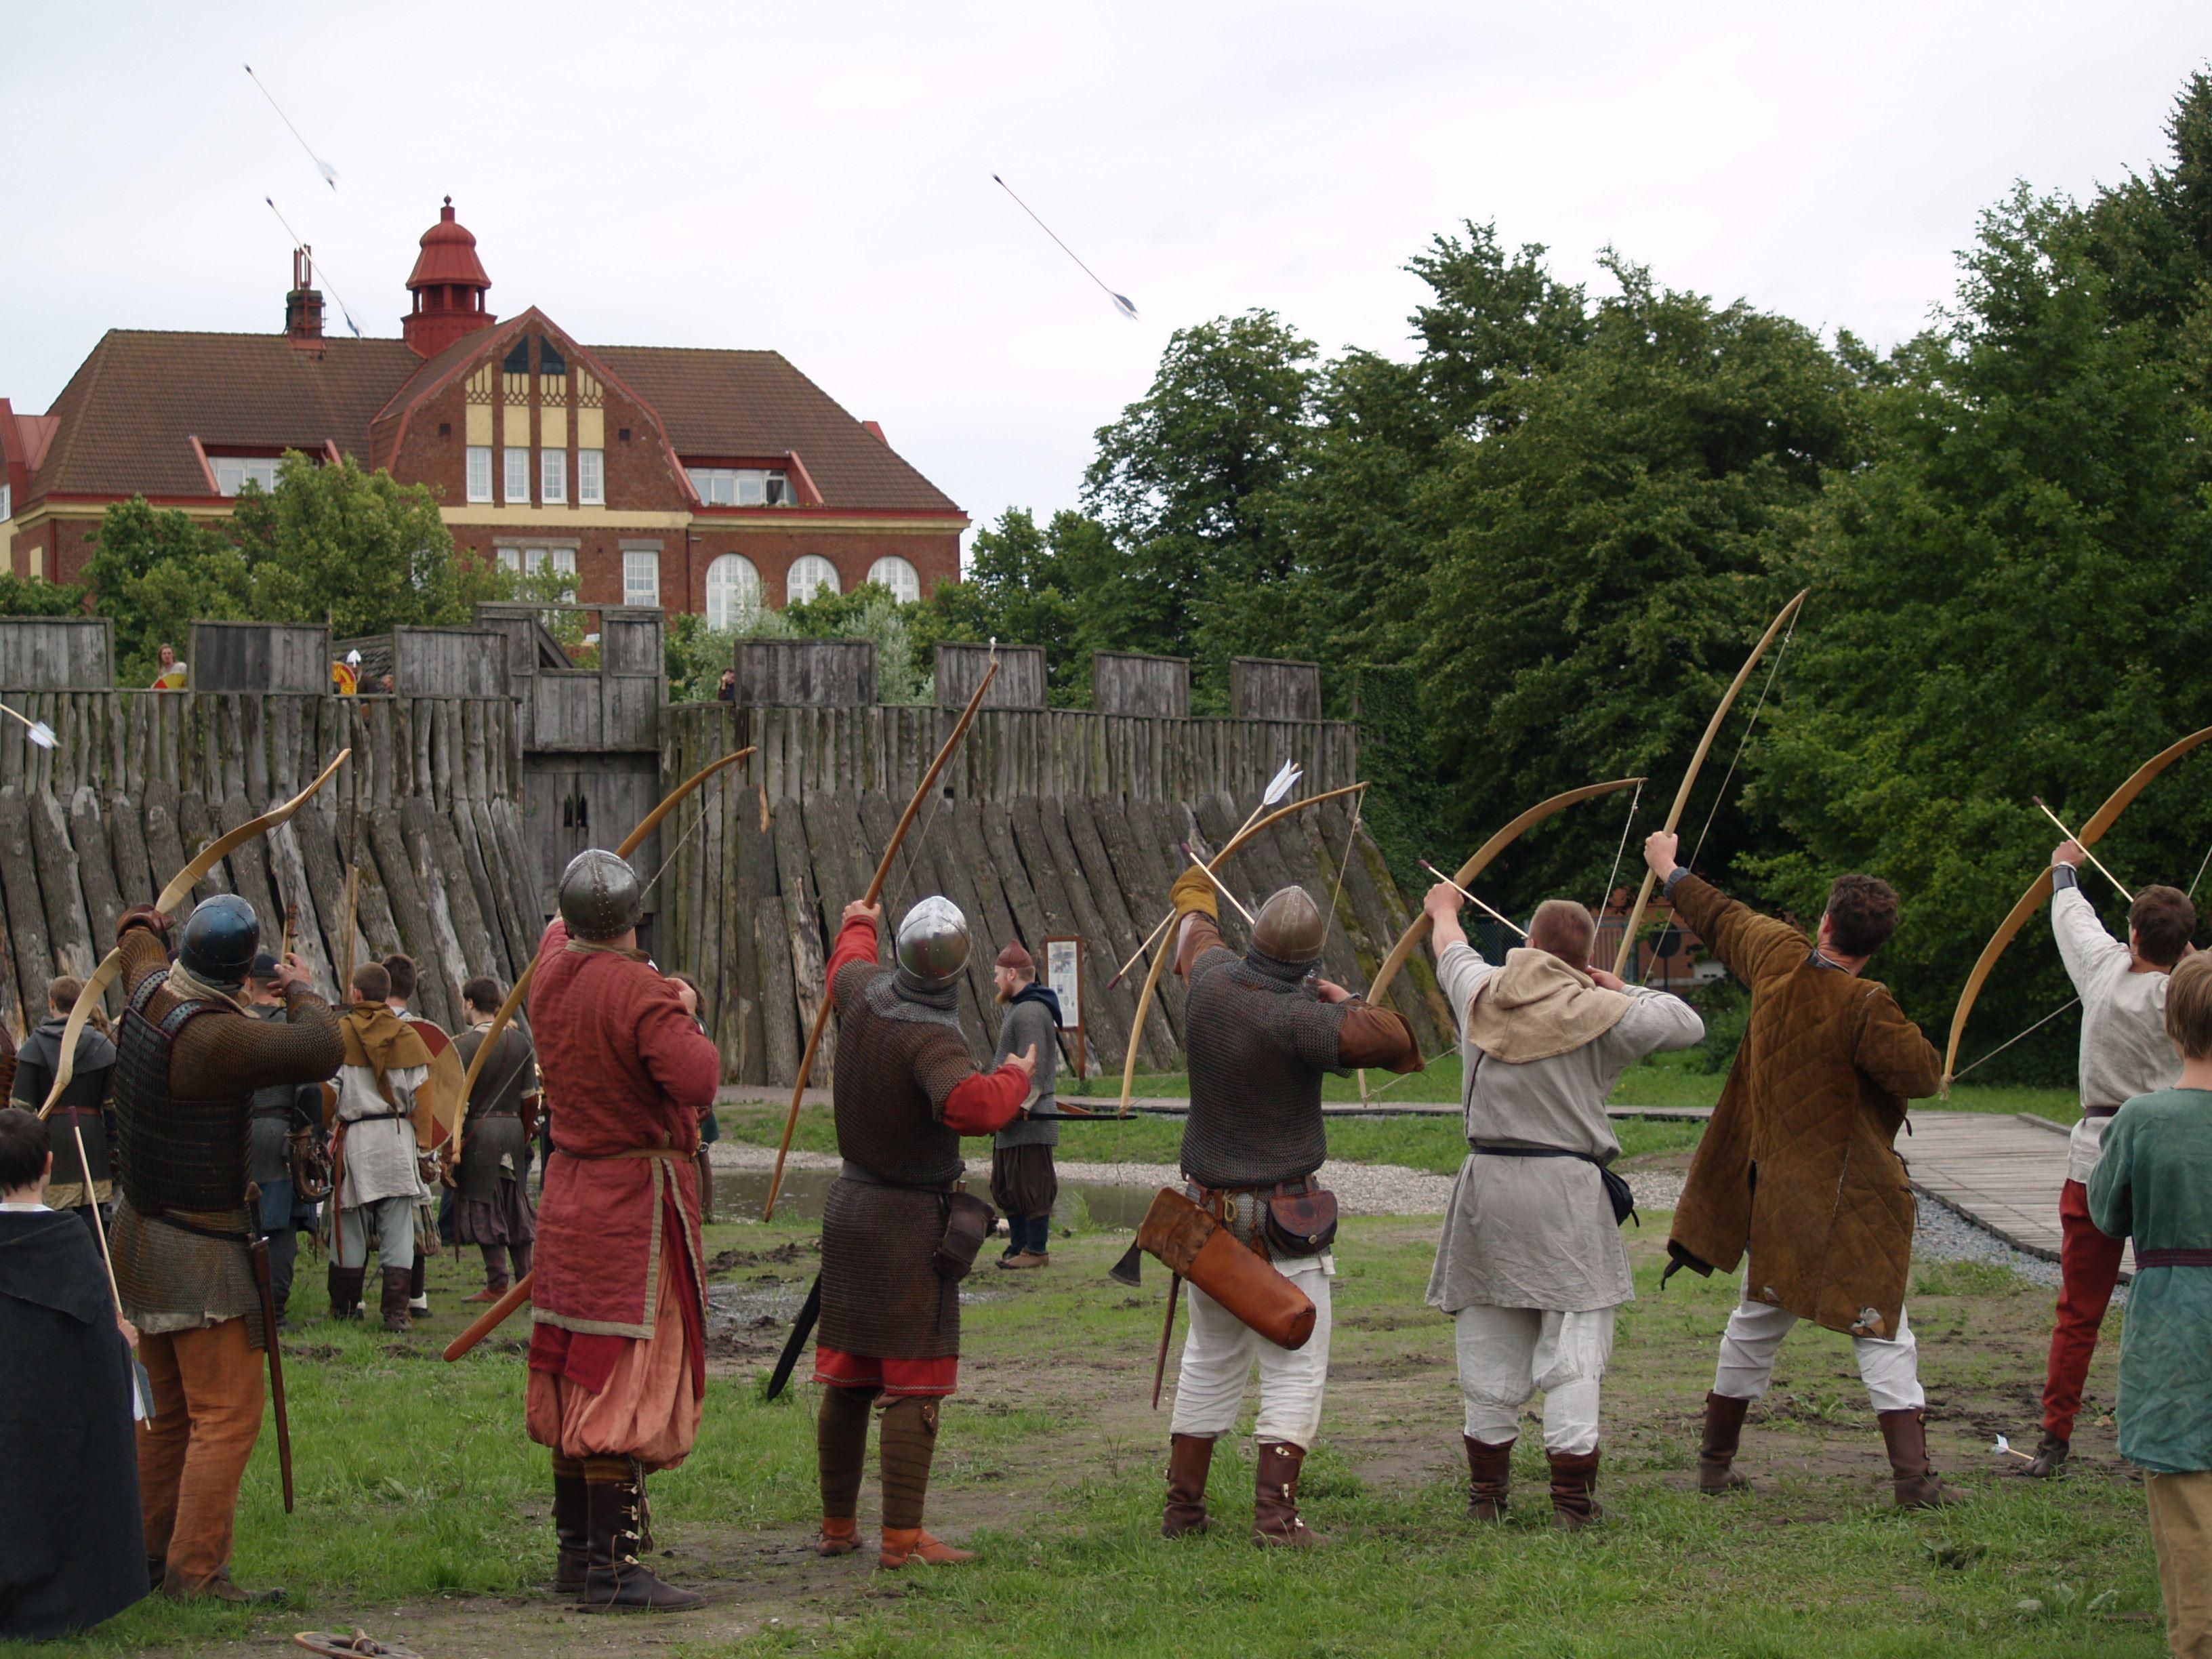 The Viking fortress Trelleborgen